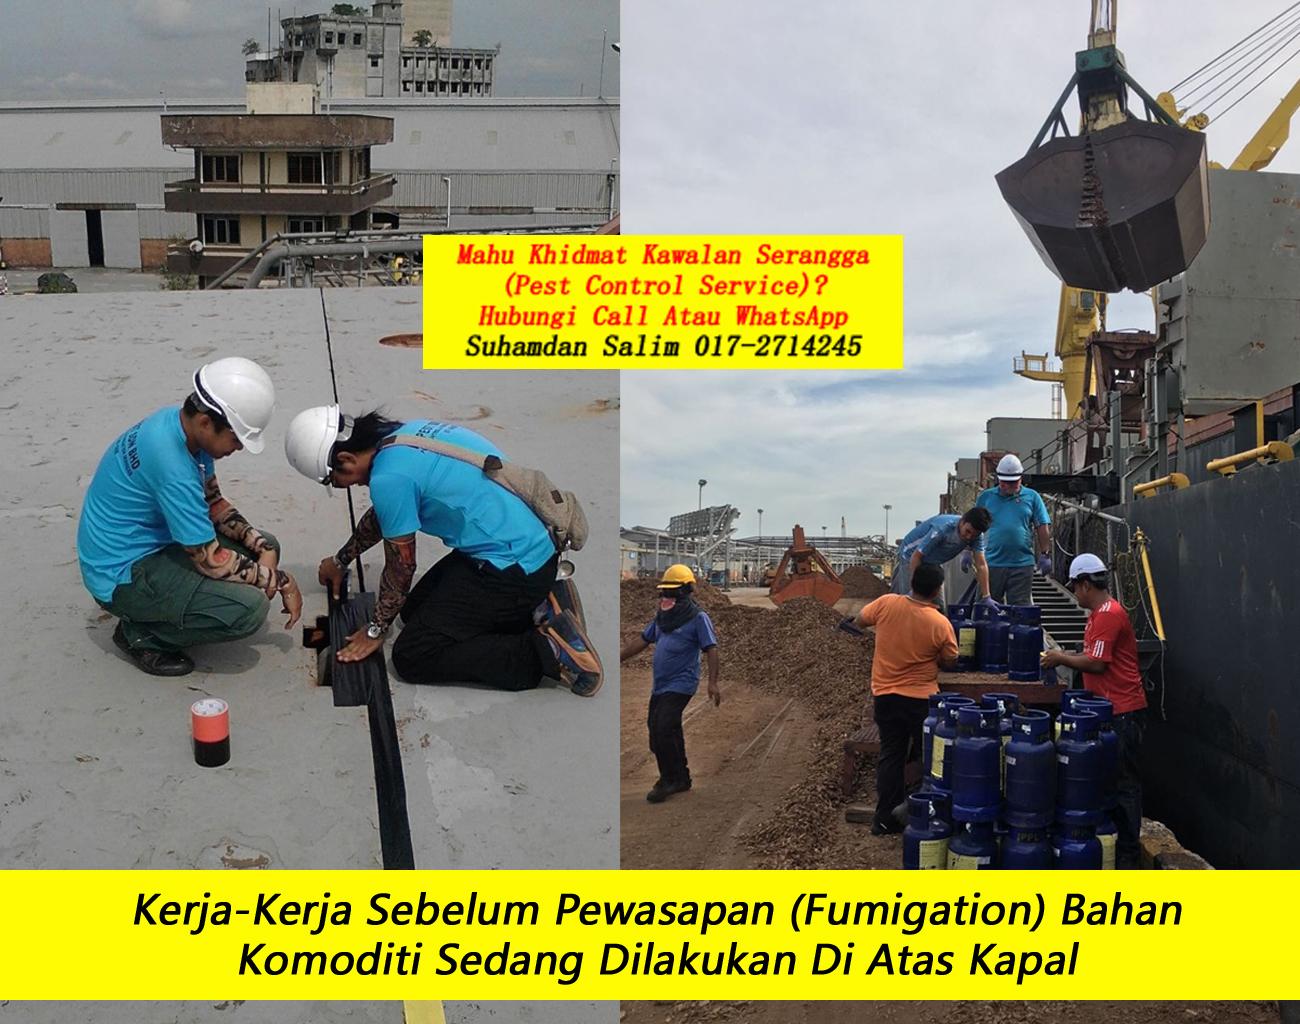 fumigation service fumigator berlesen kerja pewasapan syarikat company fumigation berlesen di masalah anai-anai Kampung Pandan kl taman taman perumahan kawasan perindustrian